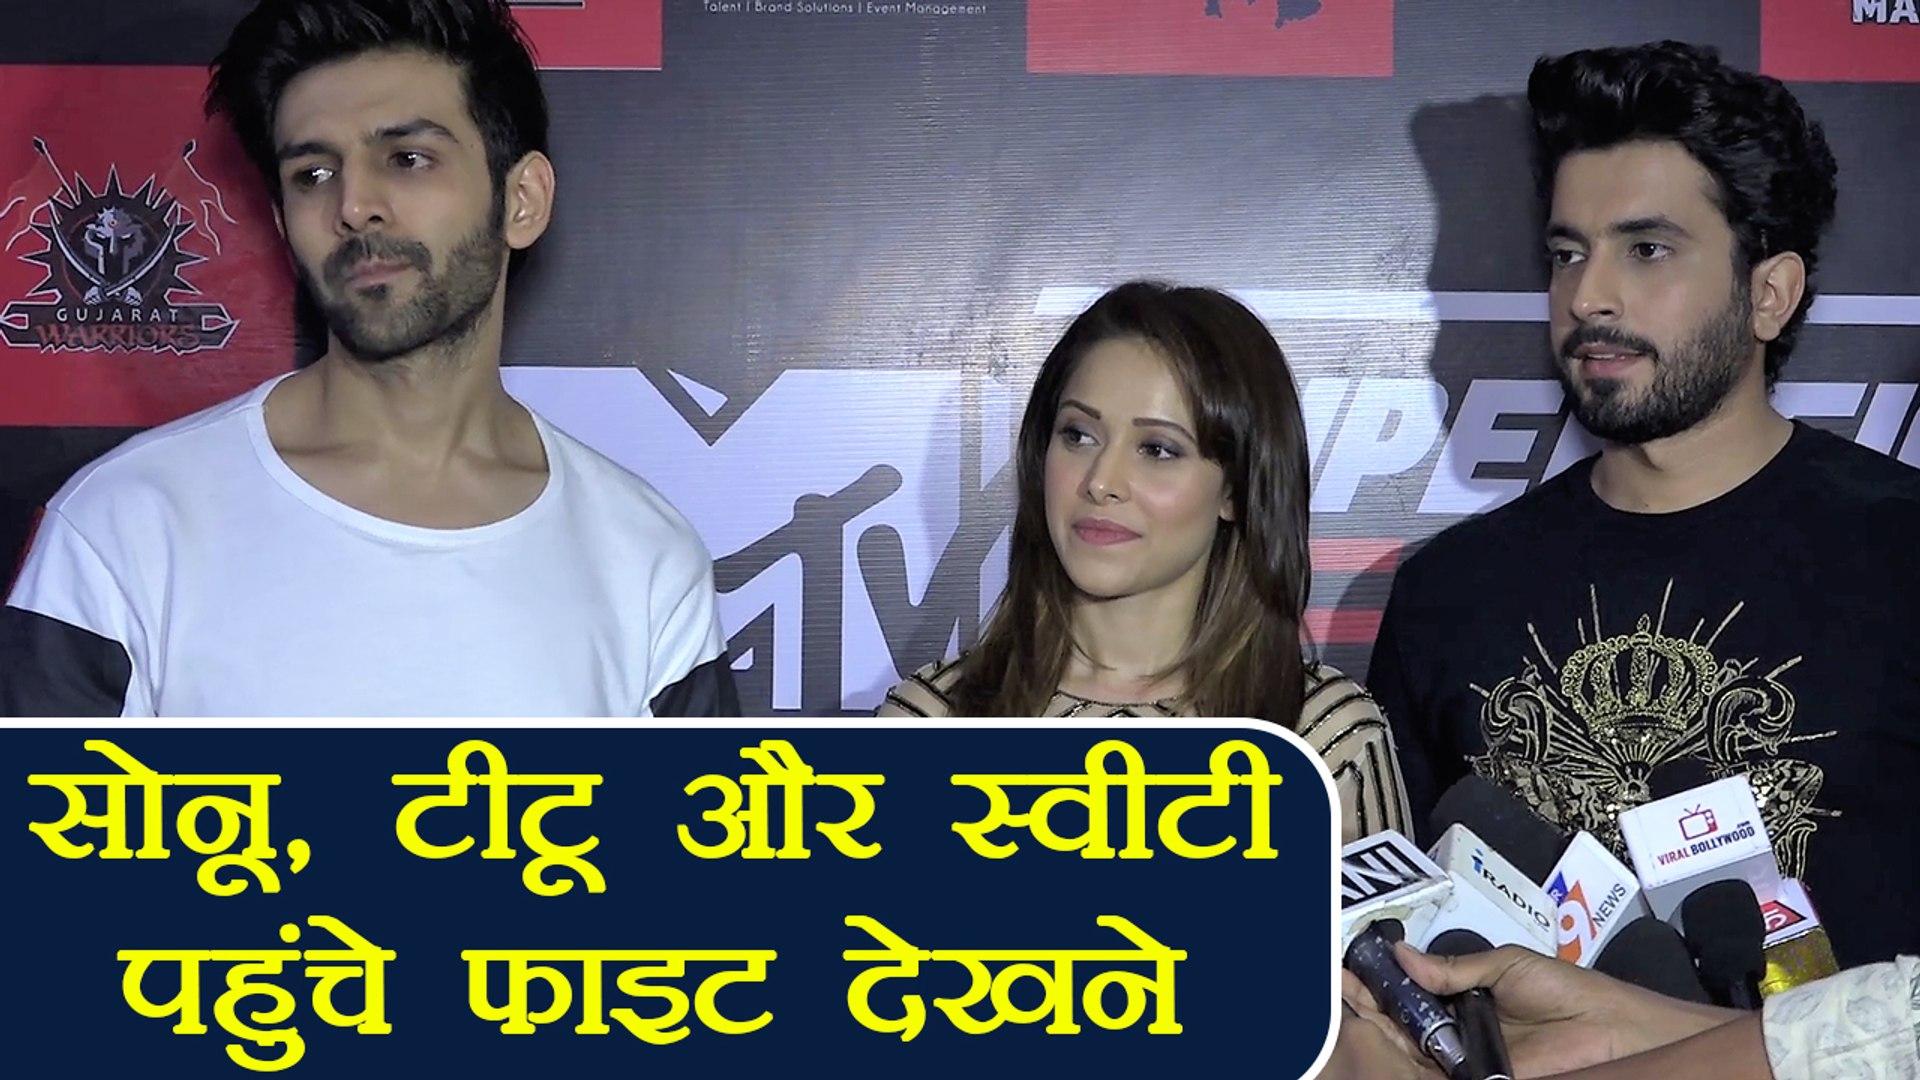 Sonu Ke Titu Ki Sweety: Karthik Aryan, Nushrat & Sunny reach to watch Super Fight League |FilmiB